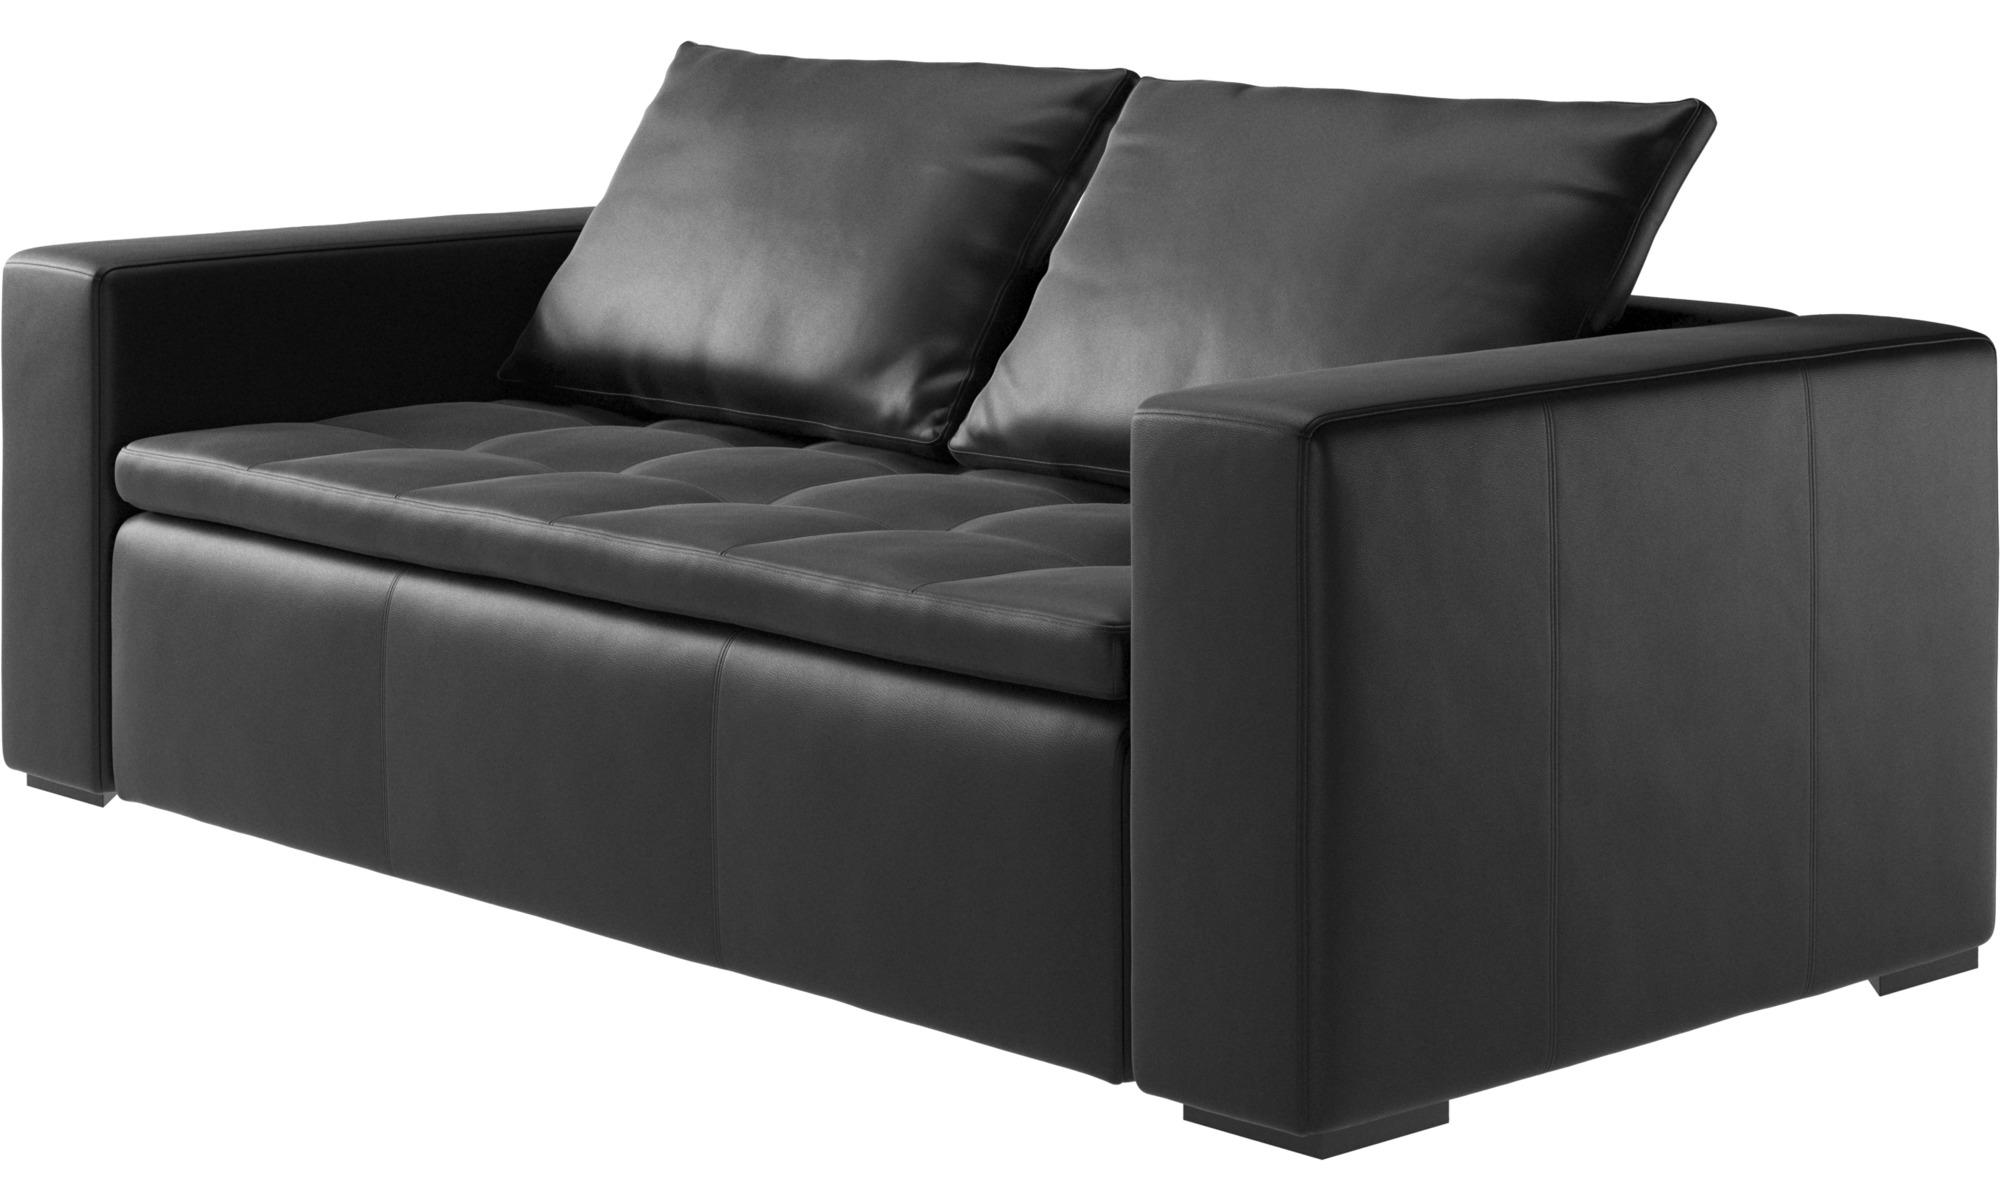 2 5 Seater Sofas Mezzo Sofa Boconcept